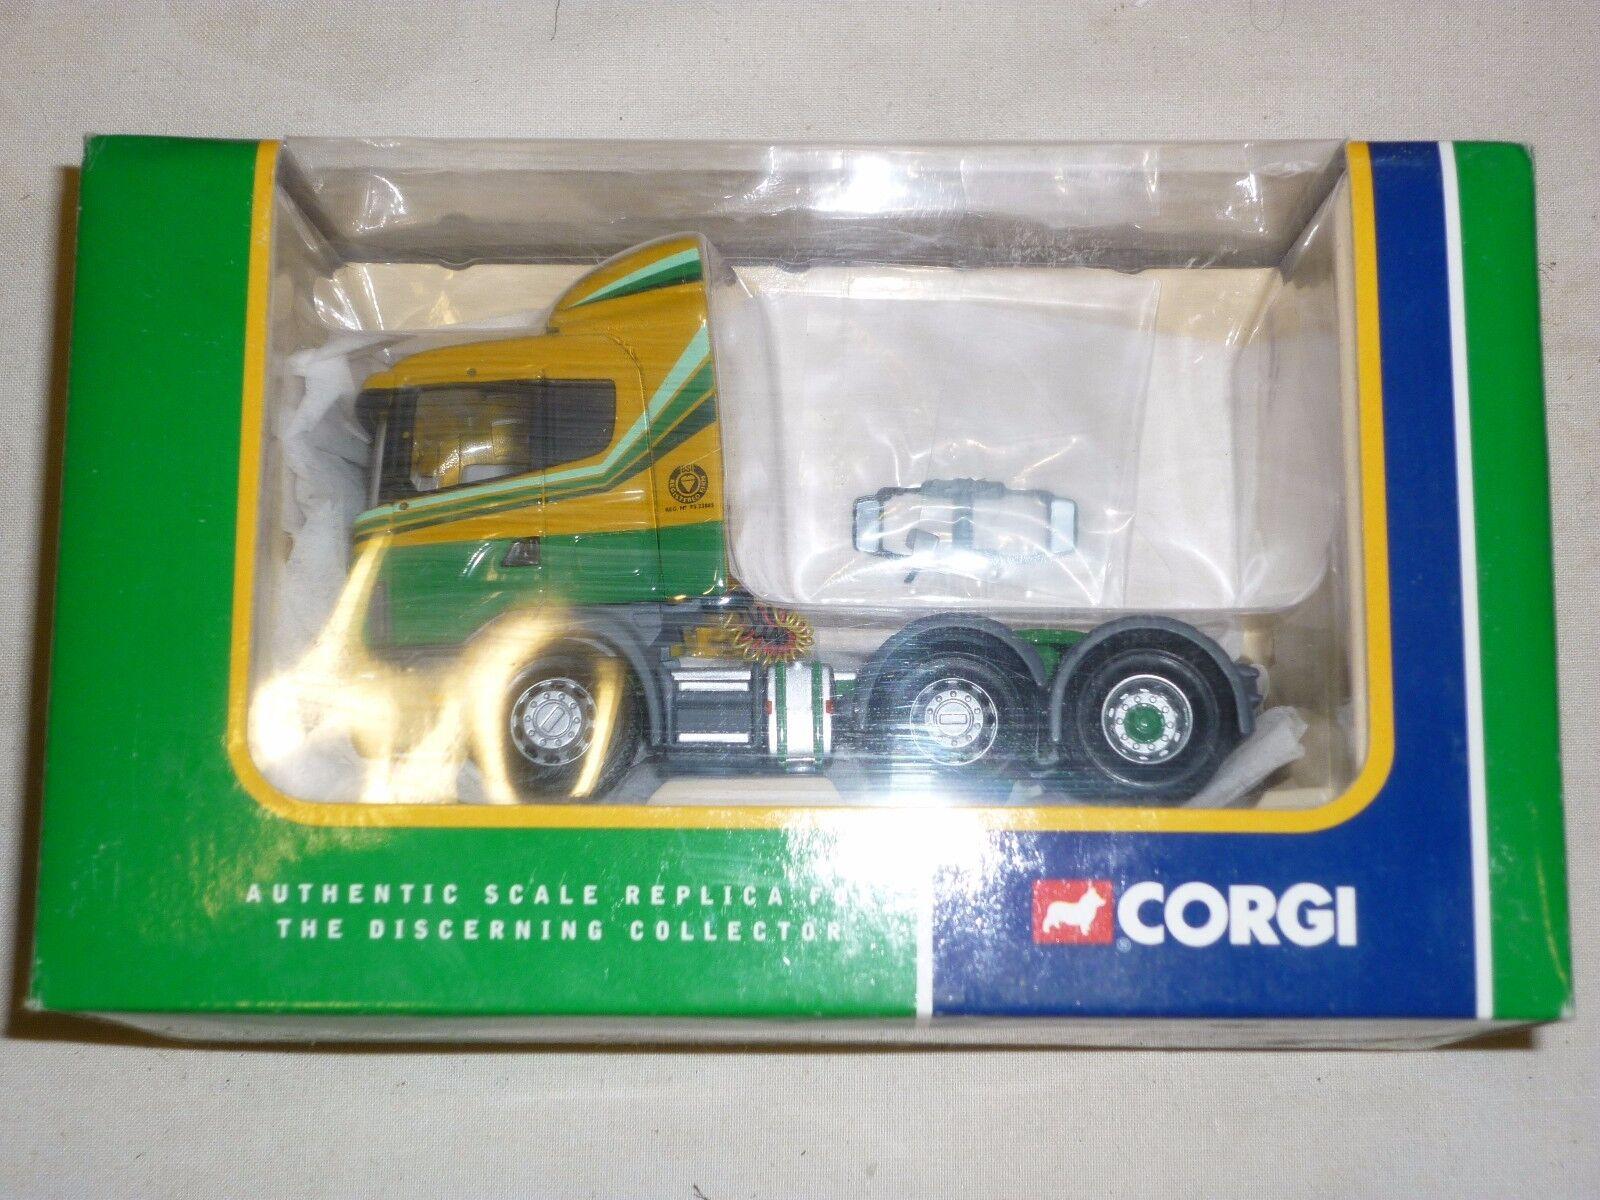 Corgi, CC 12206 Scania Scania Scania tractor unit, MacFarlane transport ltd, boxed 6c31a2